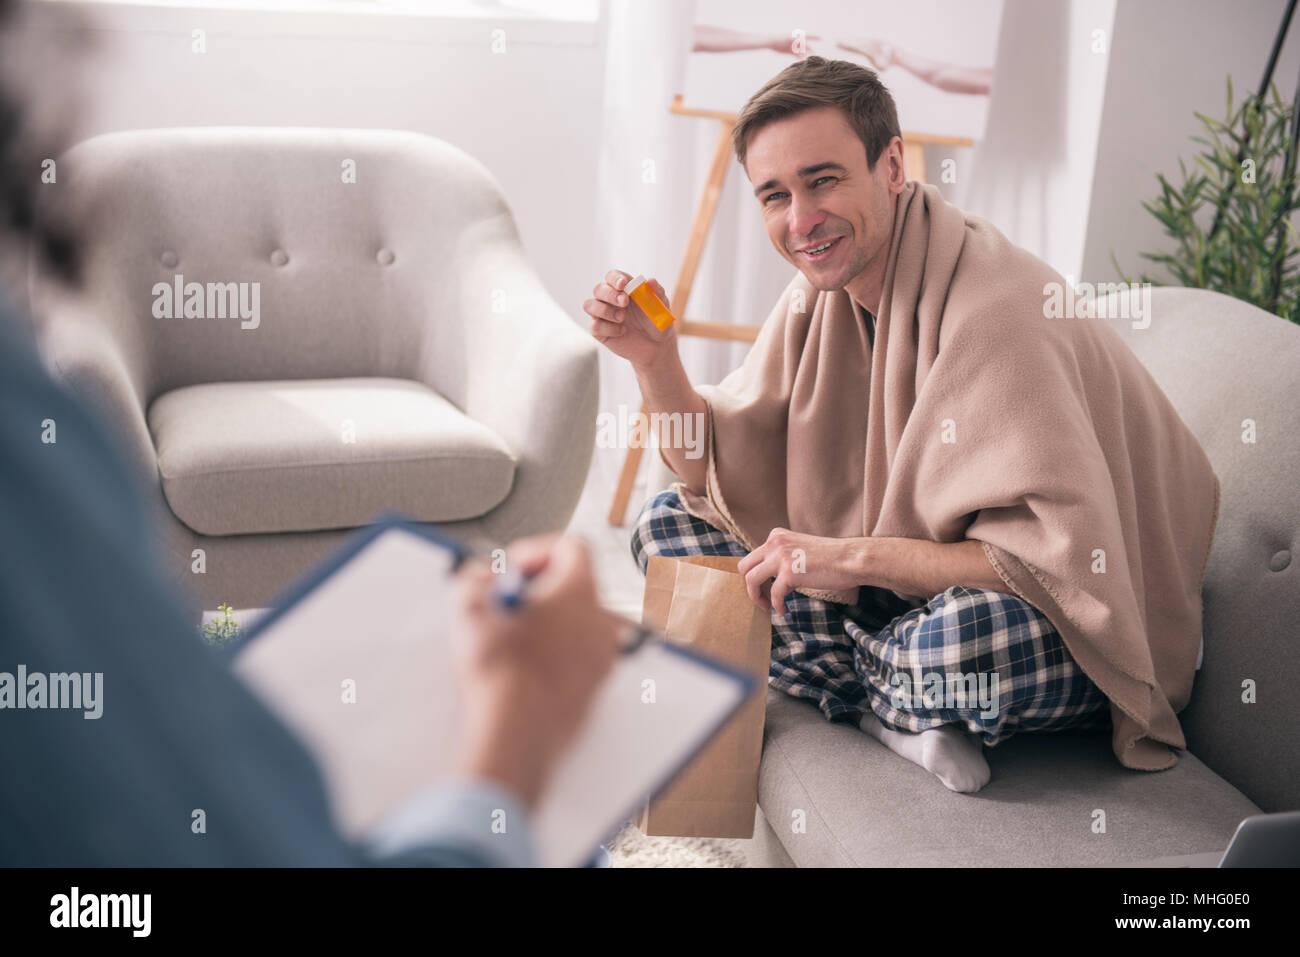 Joyful positive man holding his medicine - Stock Image